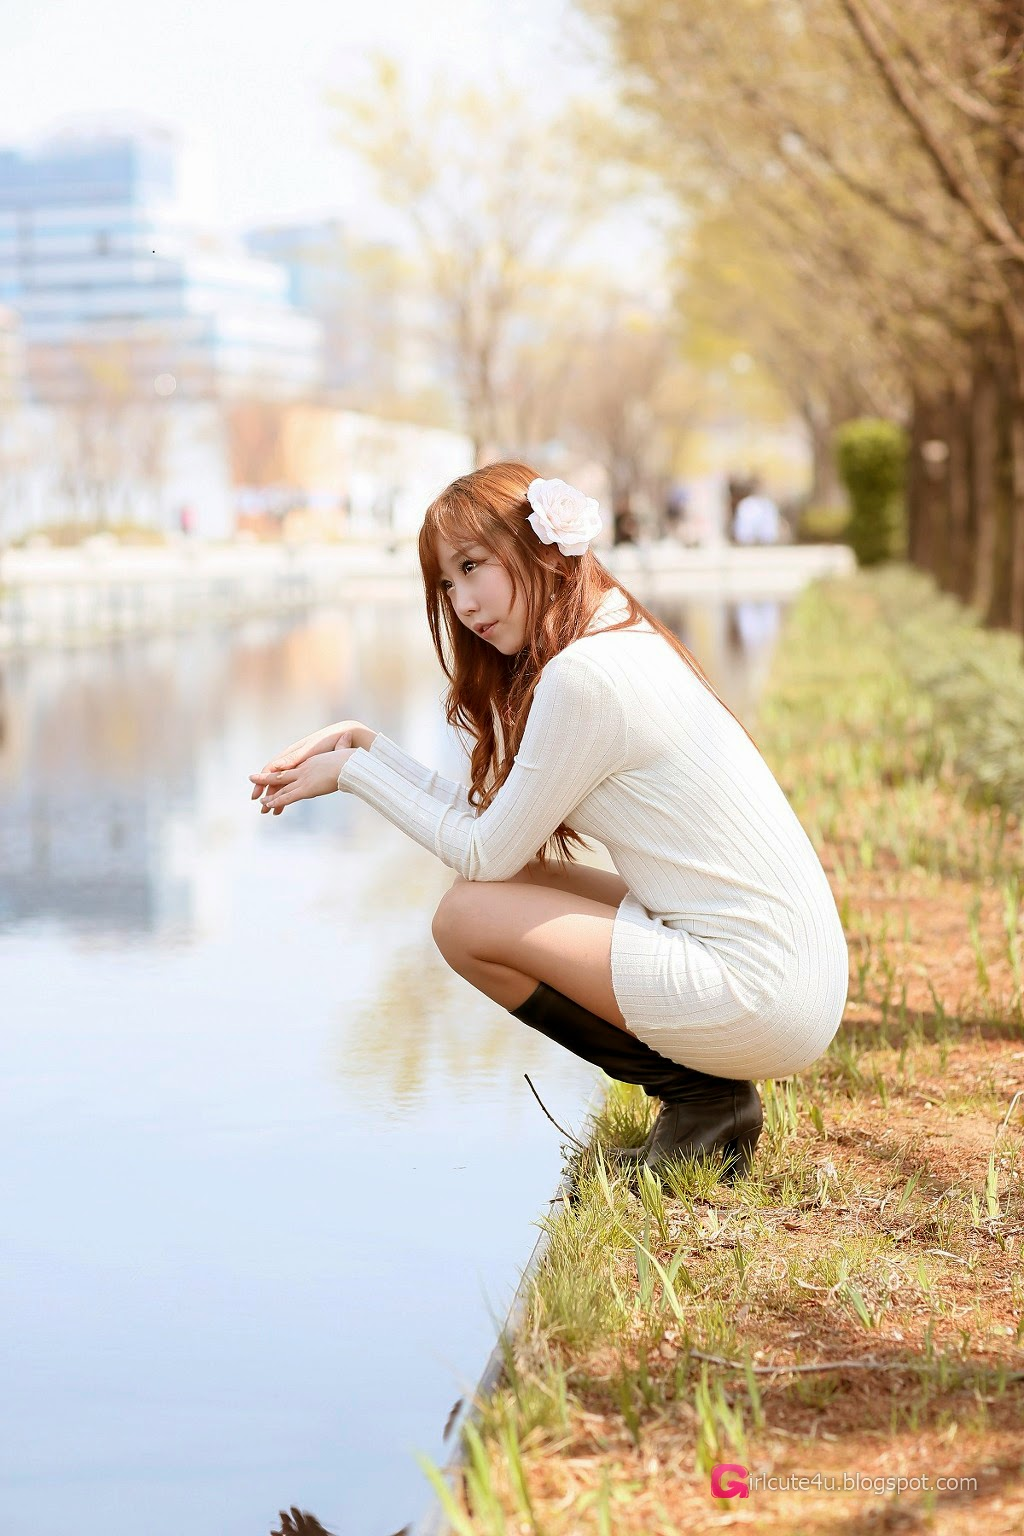 2 Kim Da On - Down By The River - very cute asian girl-girlcute4u.blogspot.com